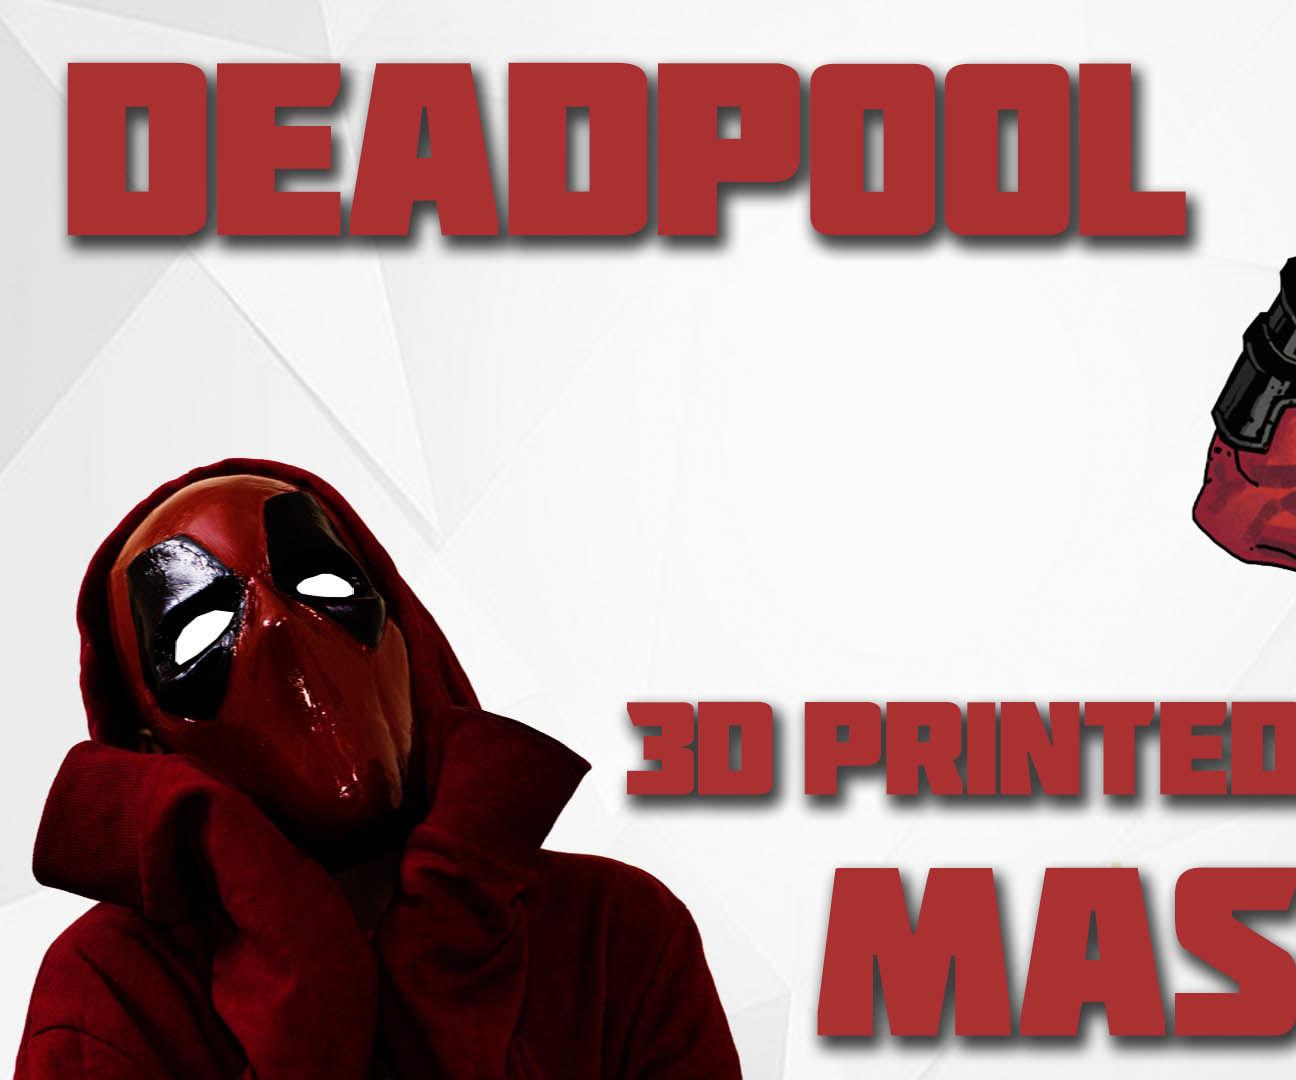 Deadpool 3D Printed Mask